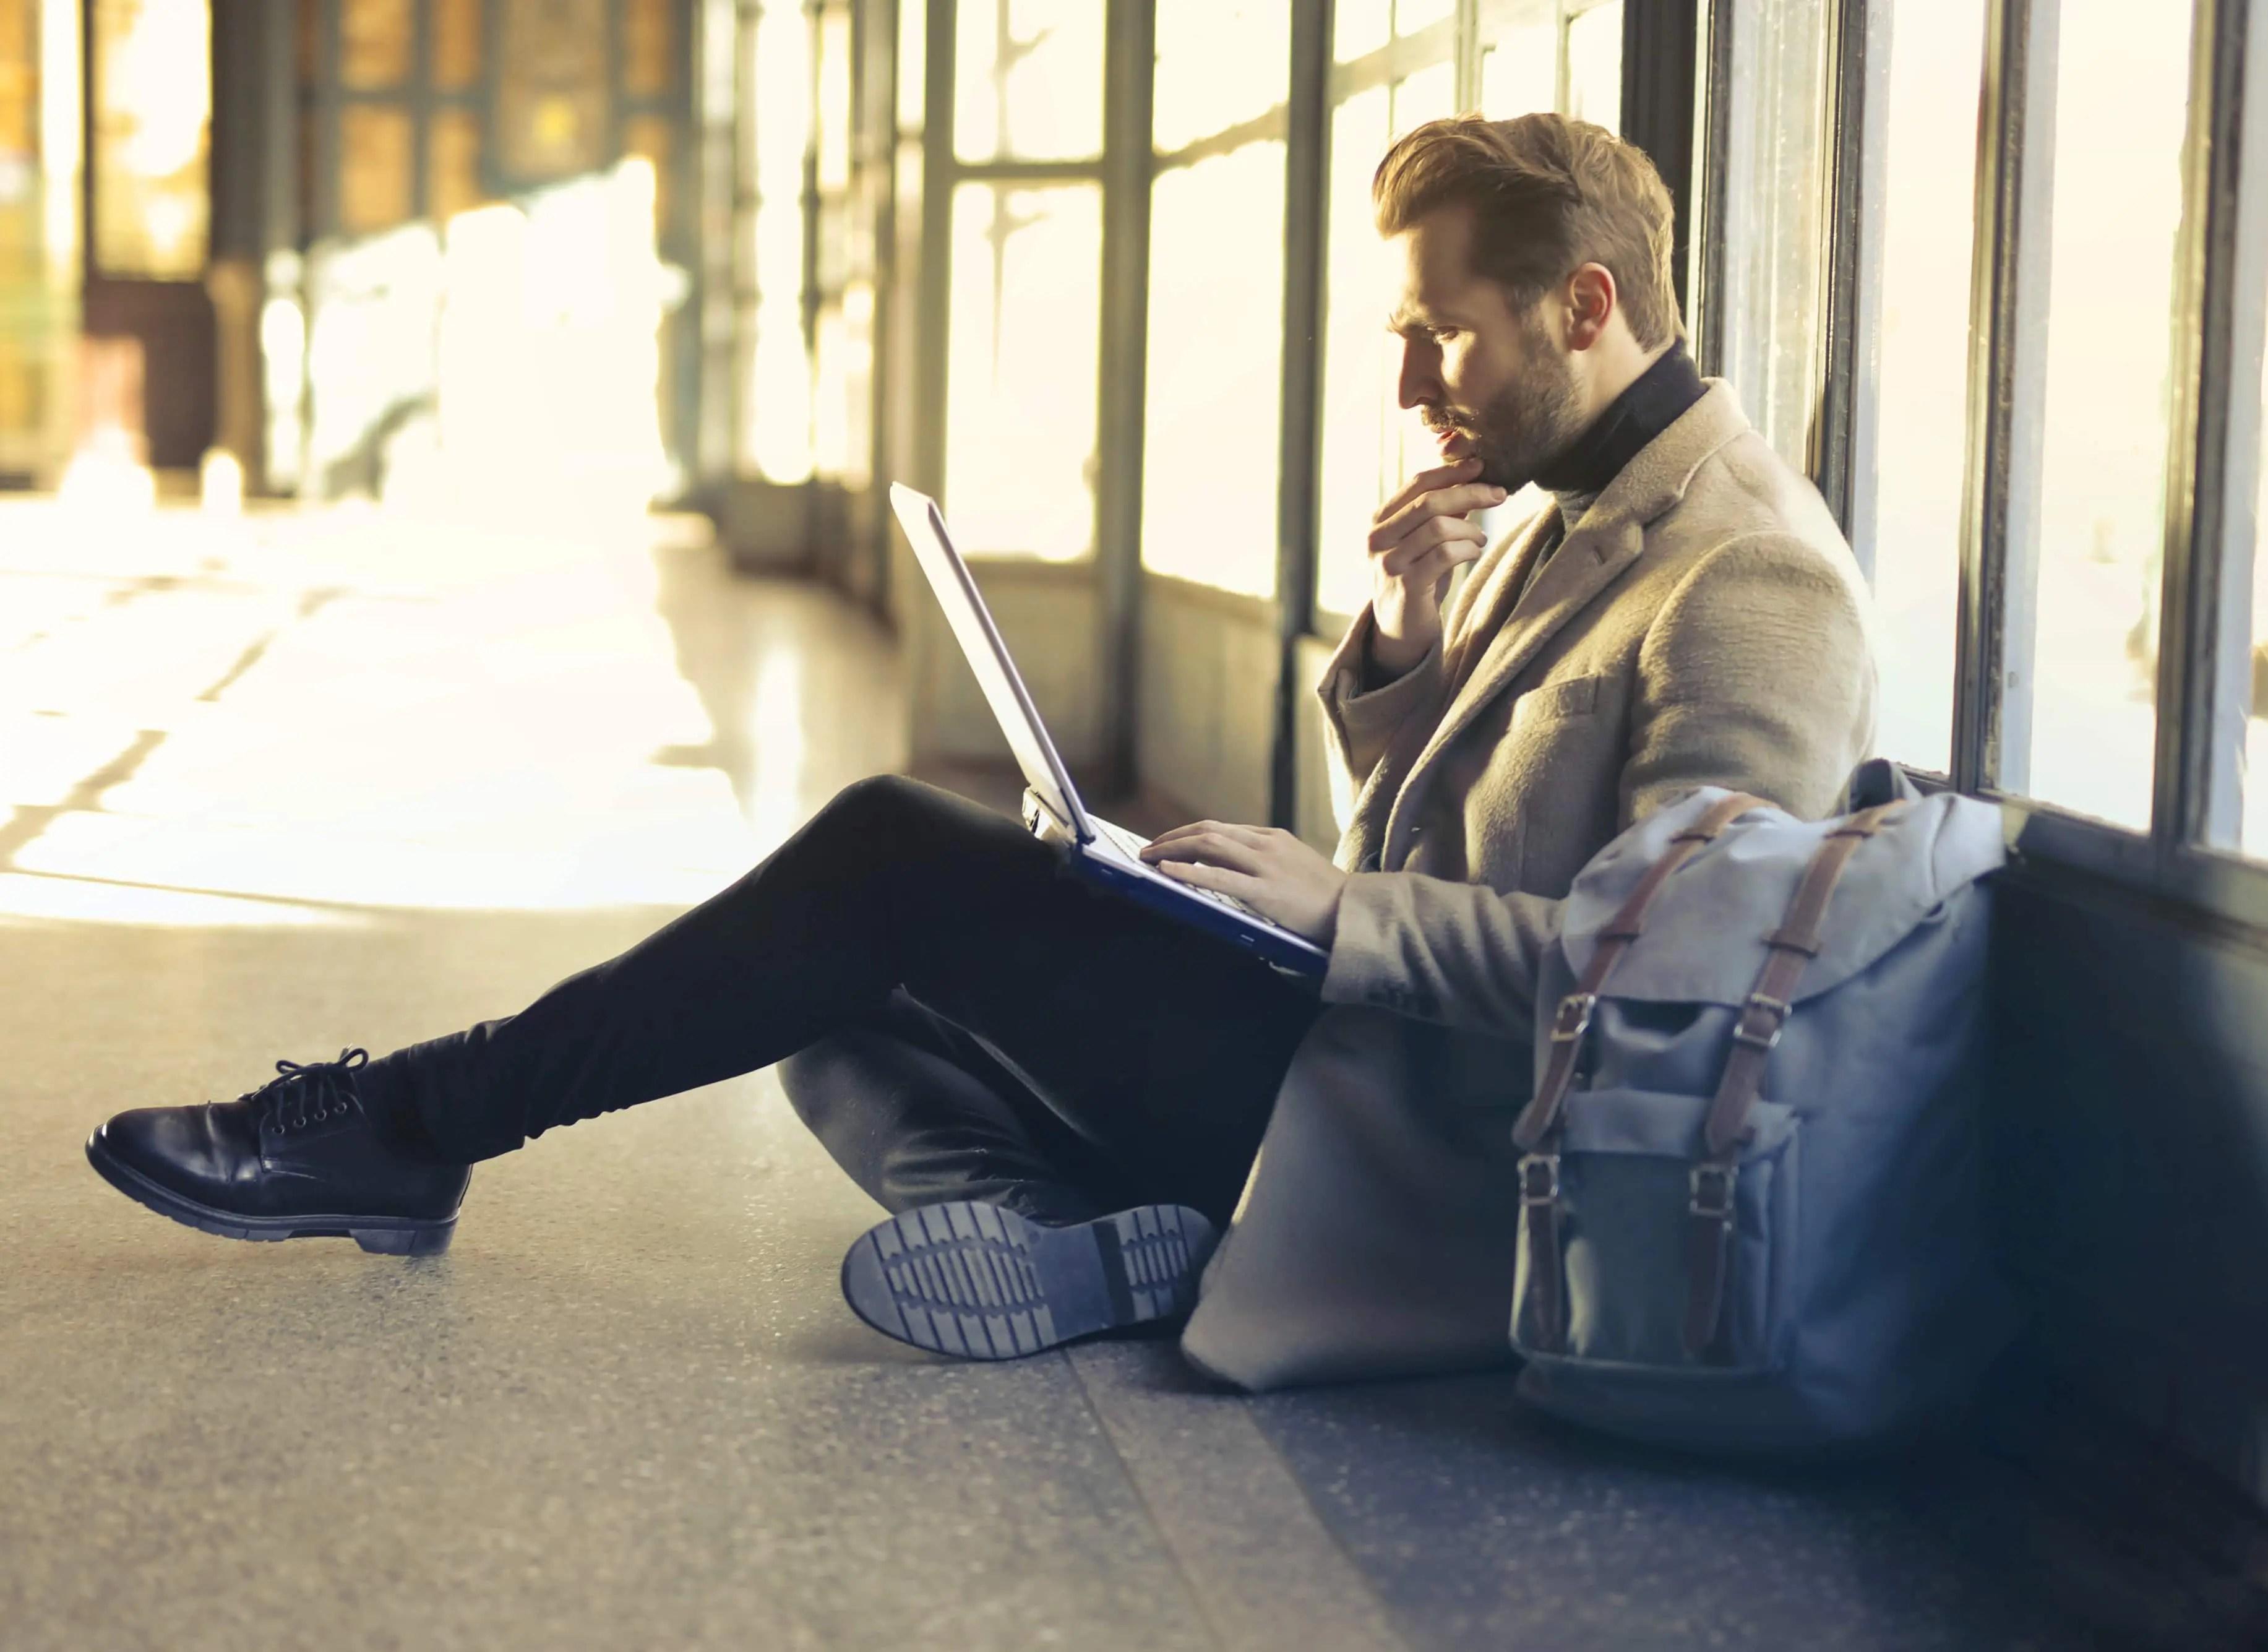 content marketing grabs their attention, interest, desire motivates action